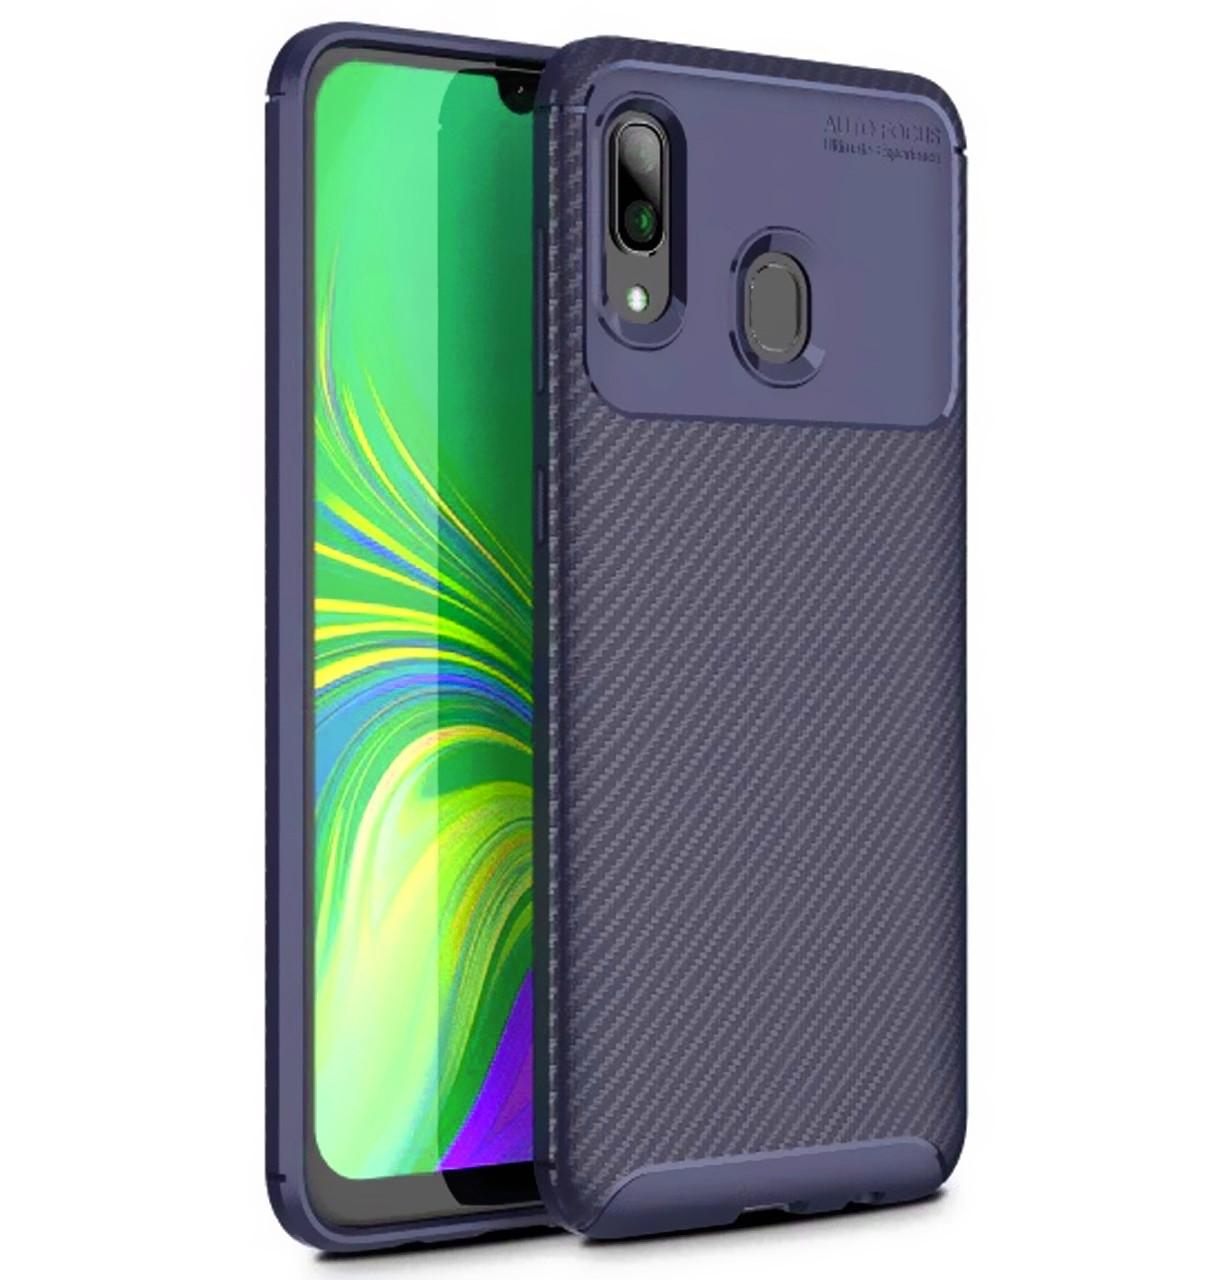 Противоударный TPU чехол iPaky Kaisy Series для Samsung Galaxy A50 (2019) SM-A505F Navy Blue